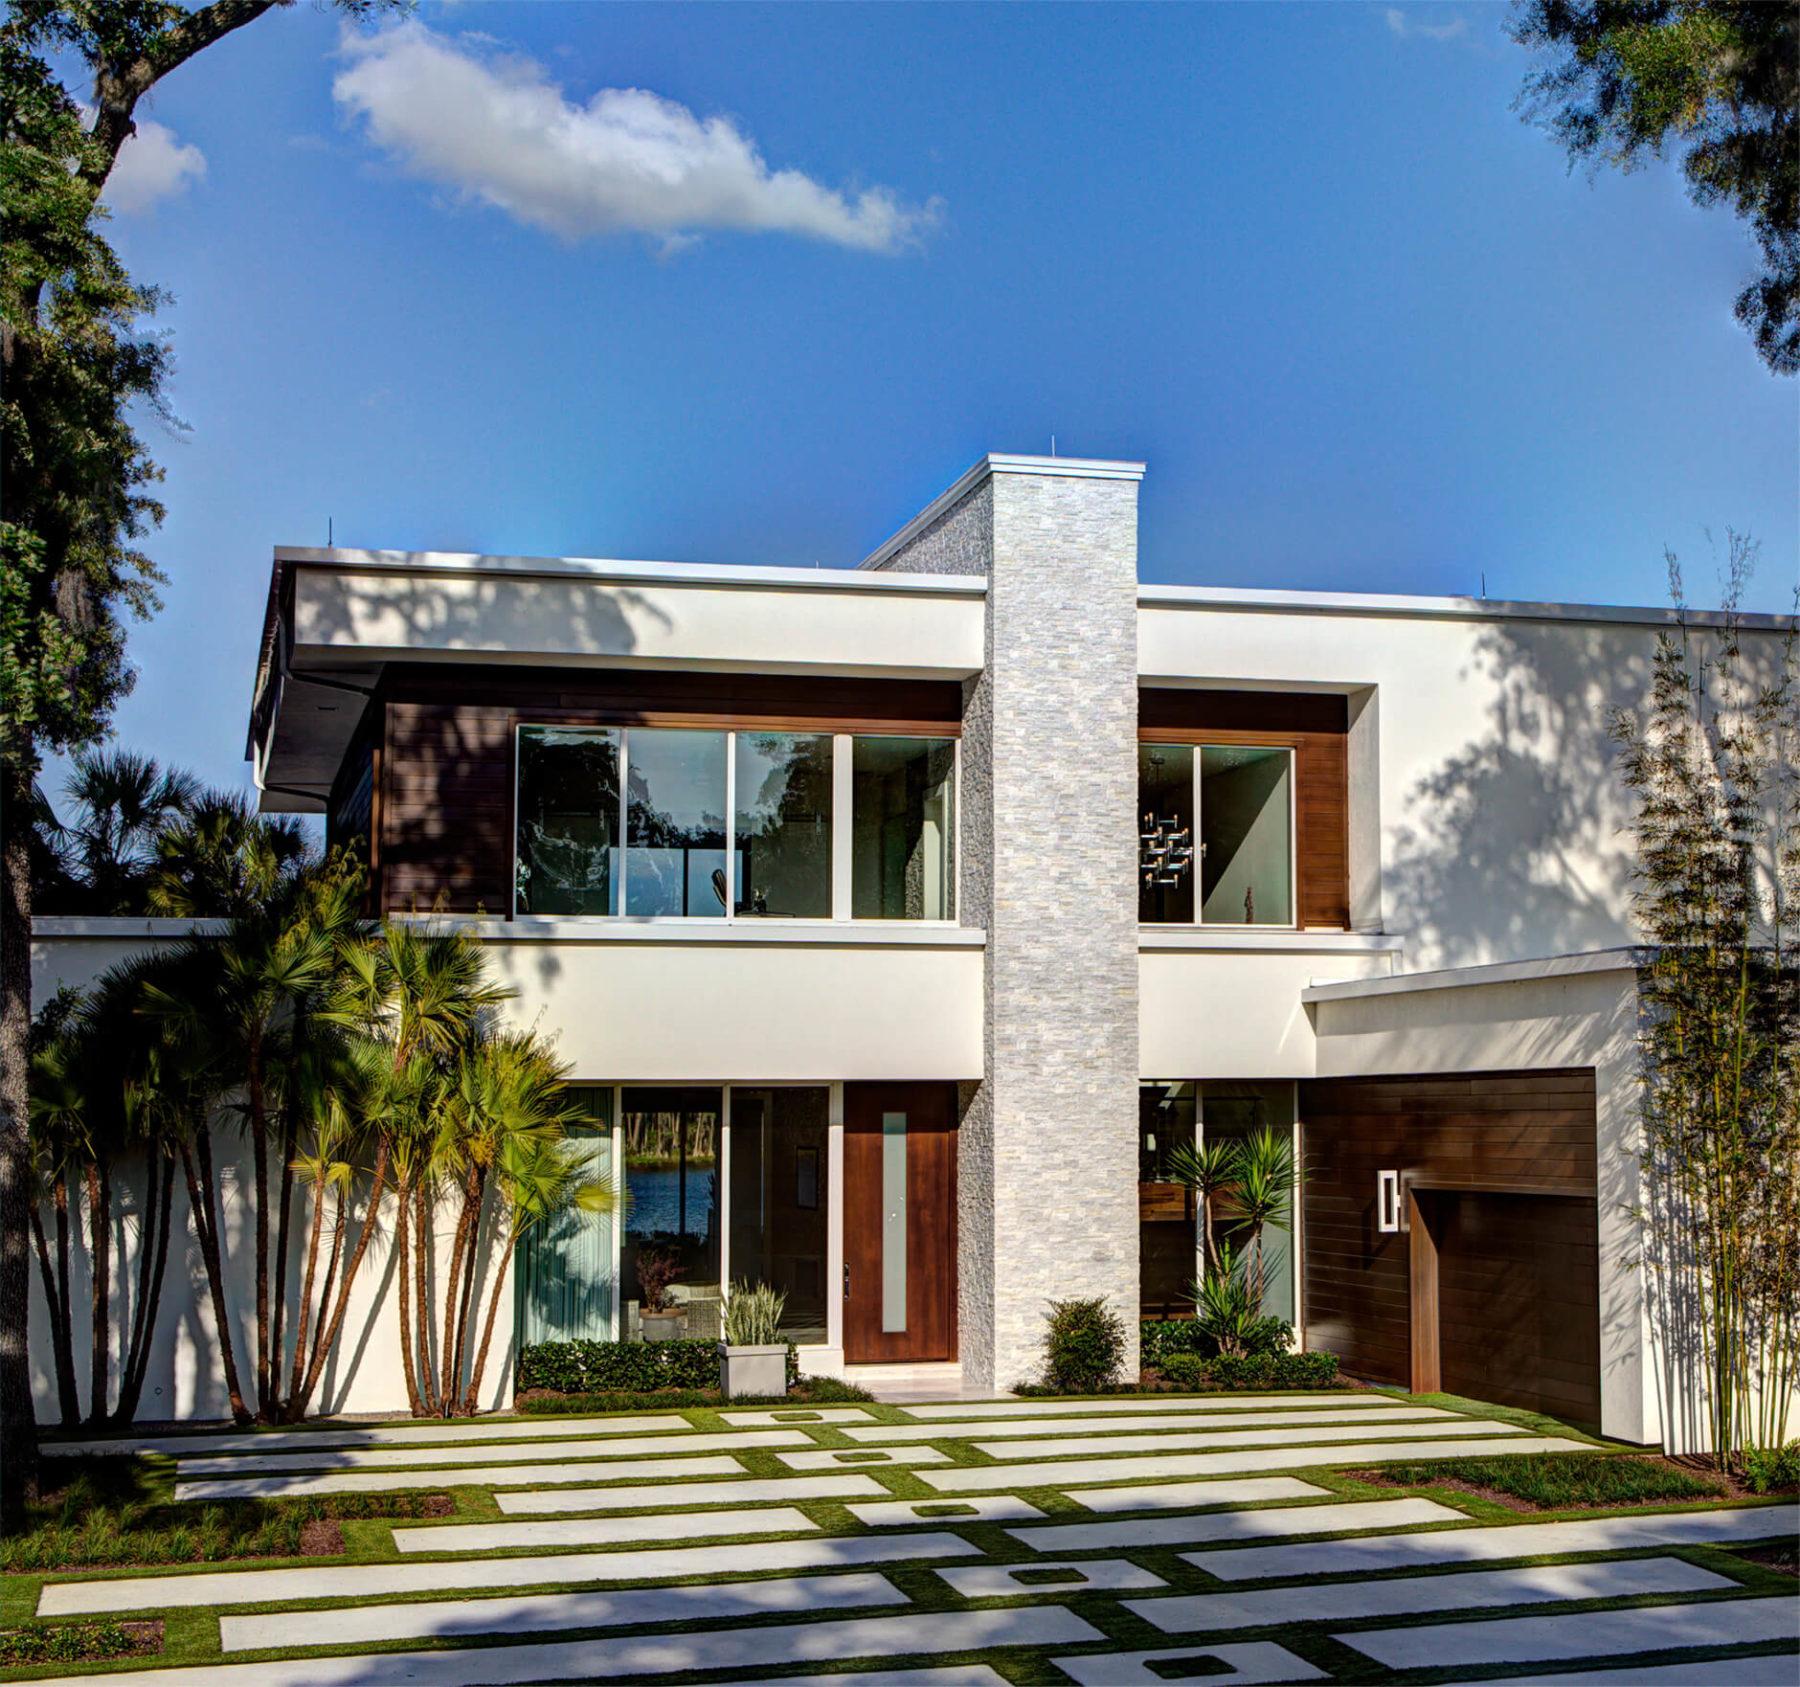 Best Kitchen Gallery: Custom Home Architect Services Phil Kean Design Group of Custom Design Home  on rachelxblog.com